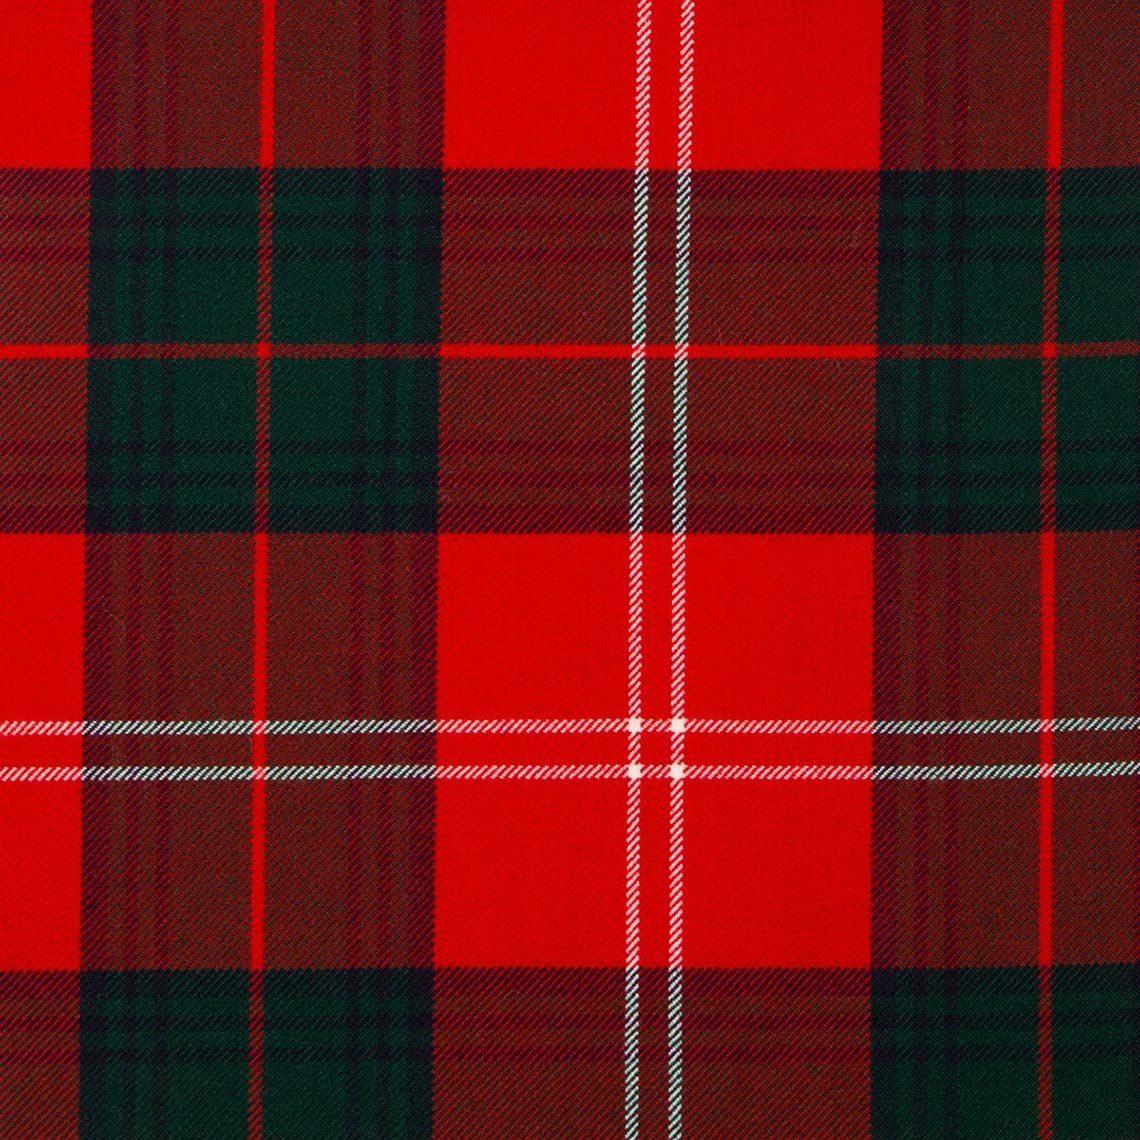 Chisholm Red (Modern) Kilt